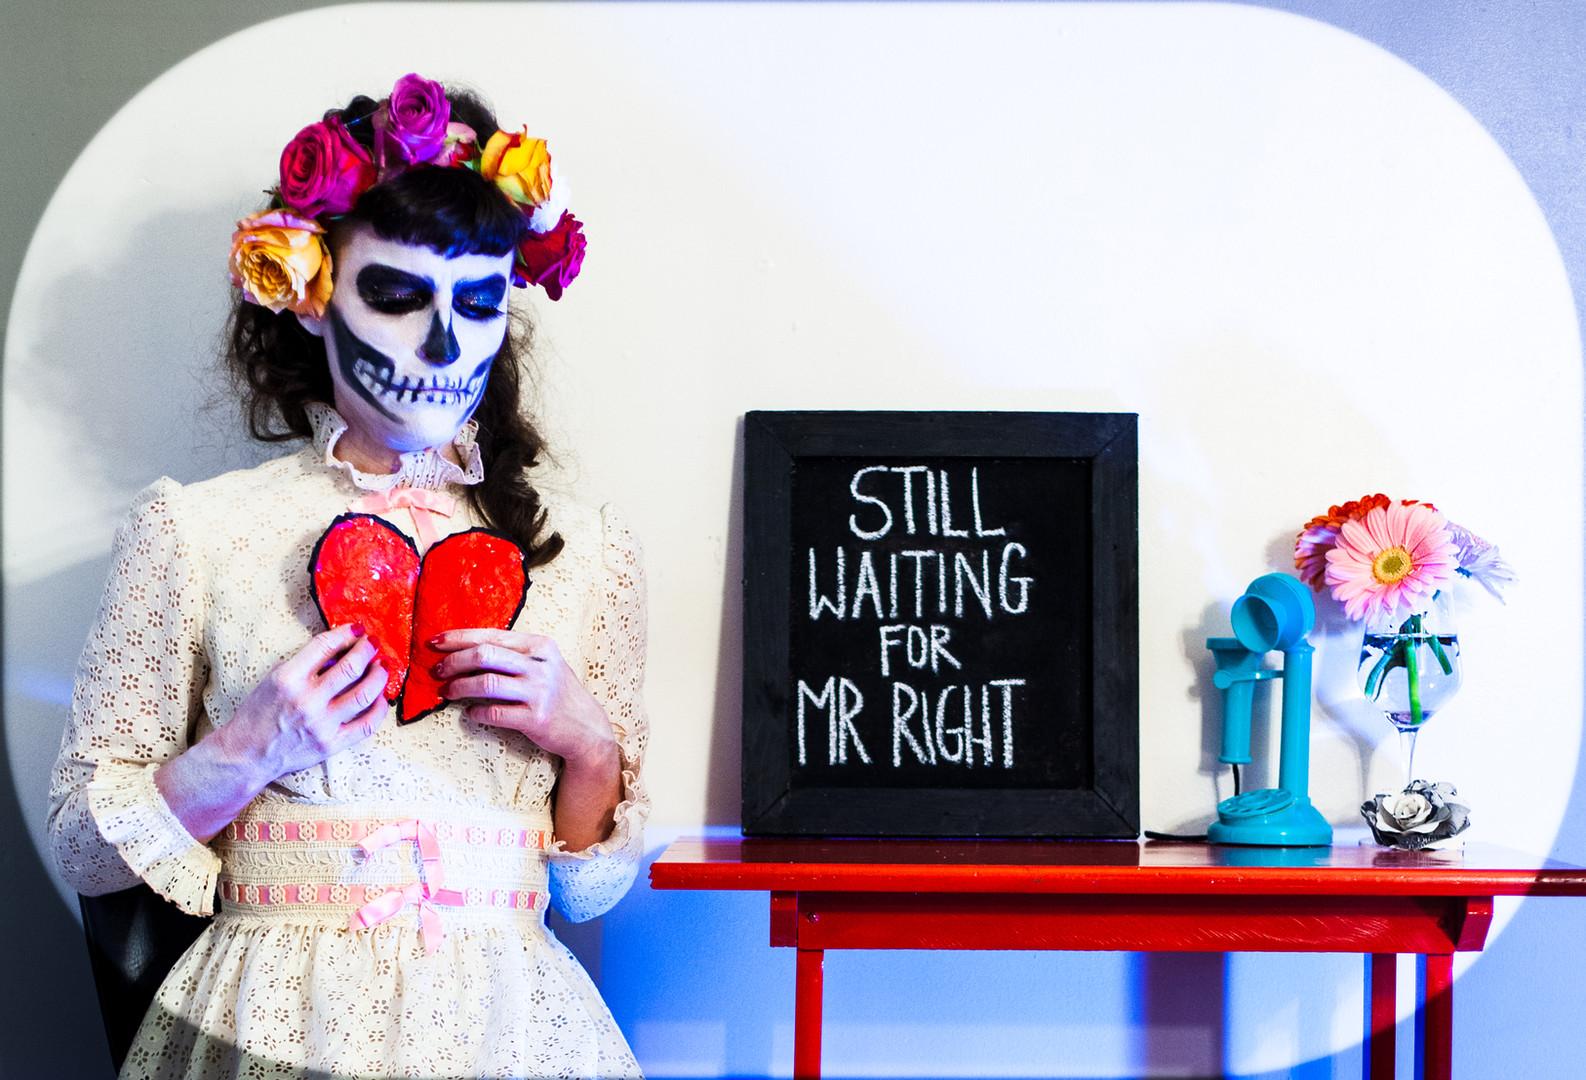 self-portrait: still waiting for mr. right, 2020